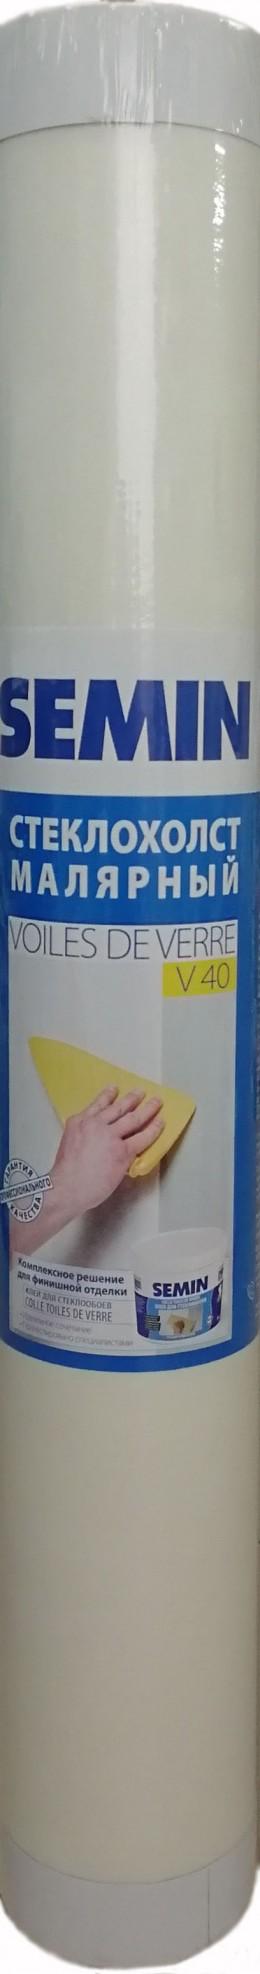 Стеклохолст малярный VOILES DE VERRE V40 Semin